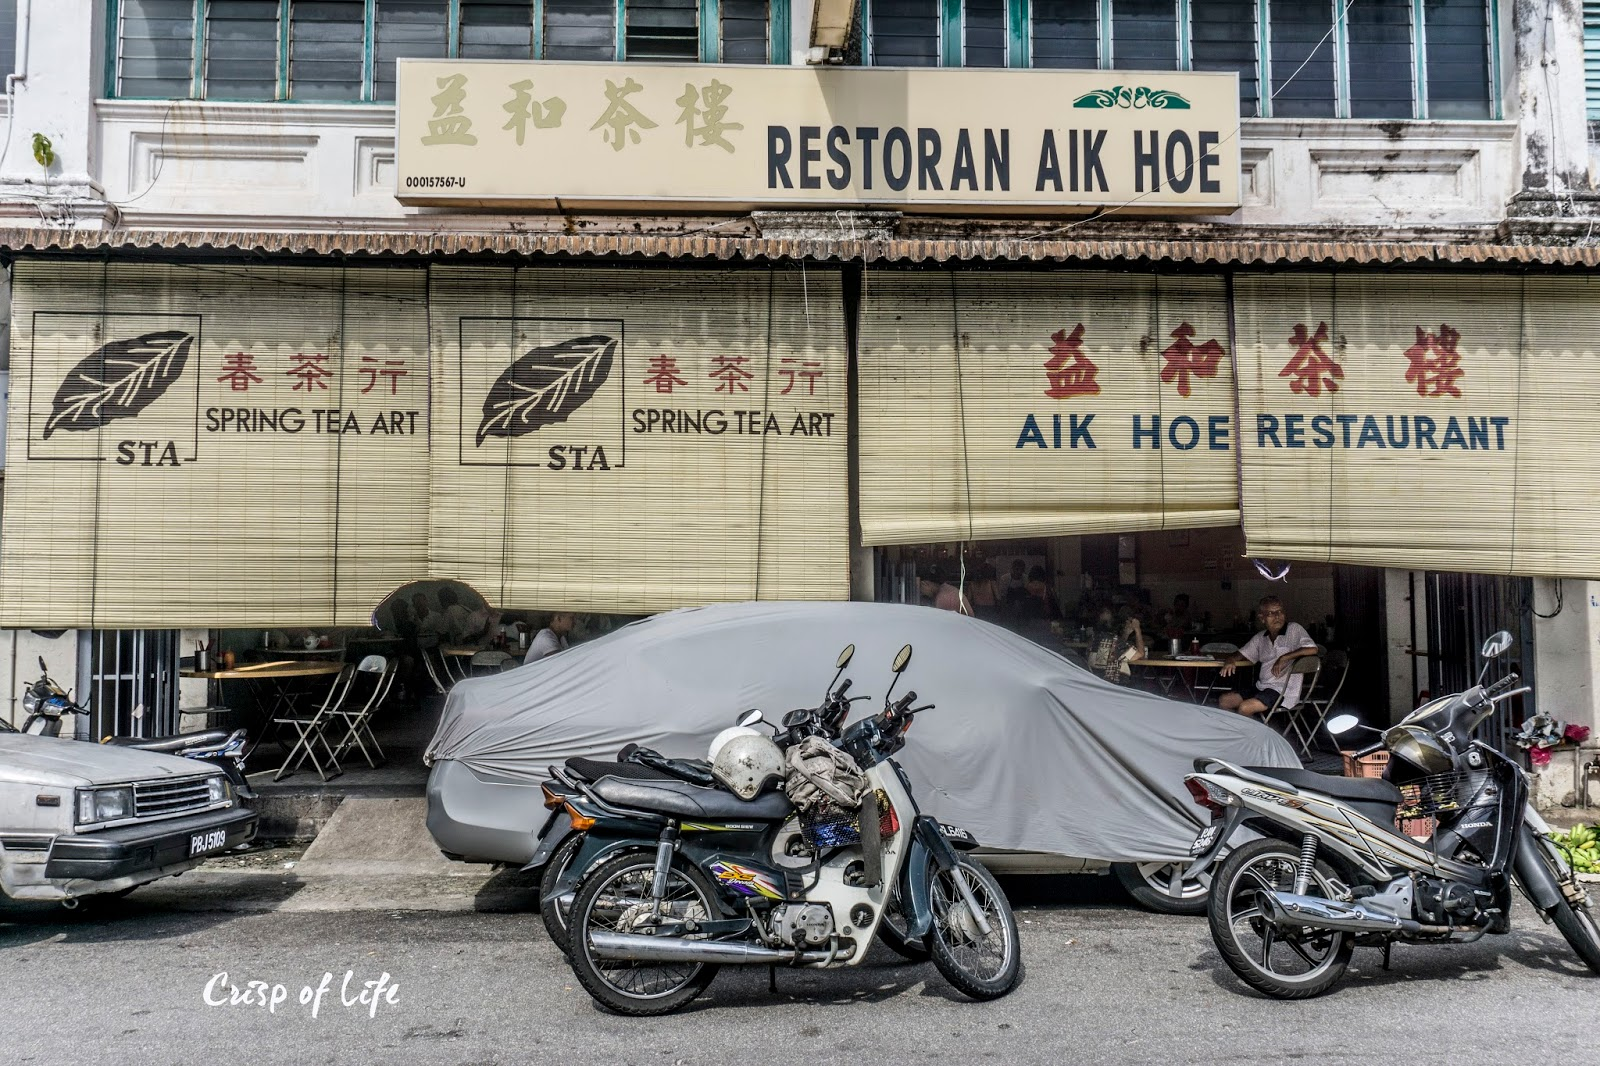 Aik Hoe Dim Sum 益和茶楼 @ Lebuh Carnavon, Penang